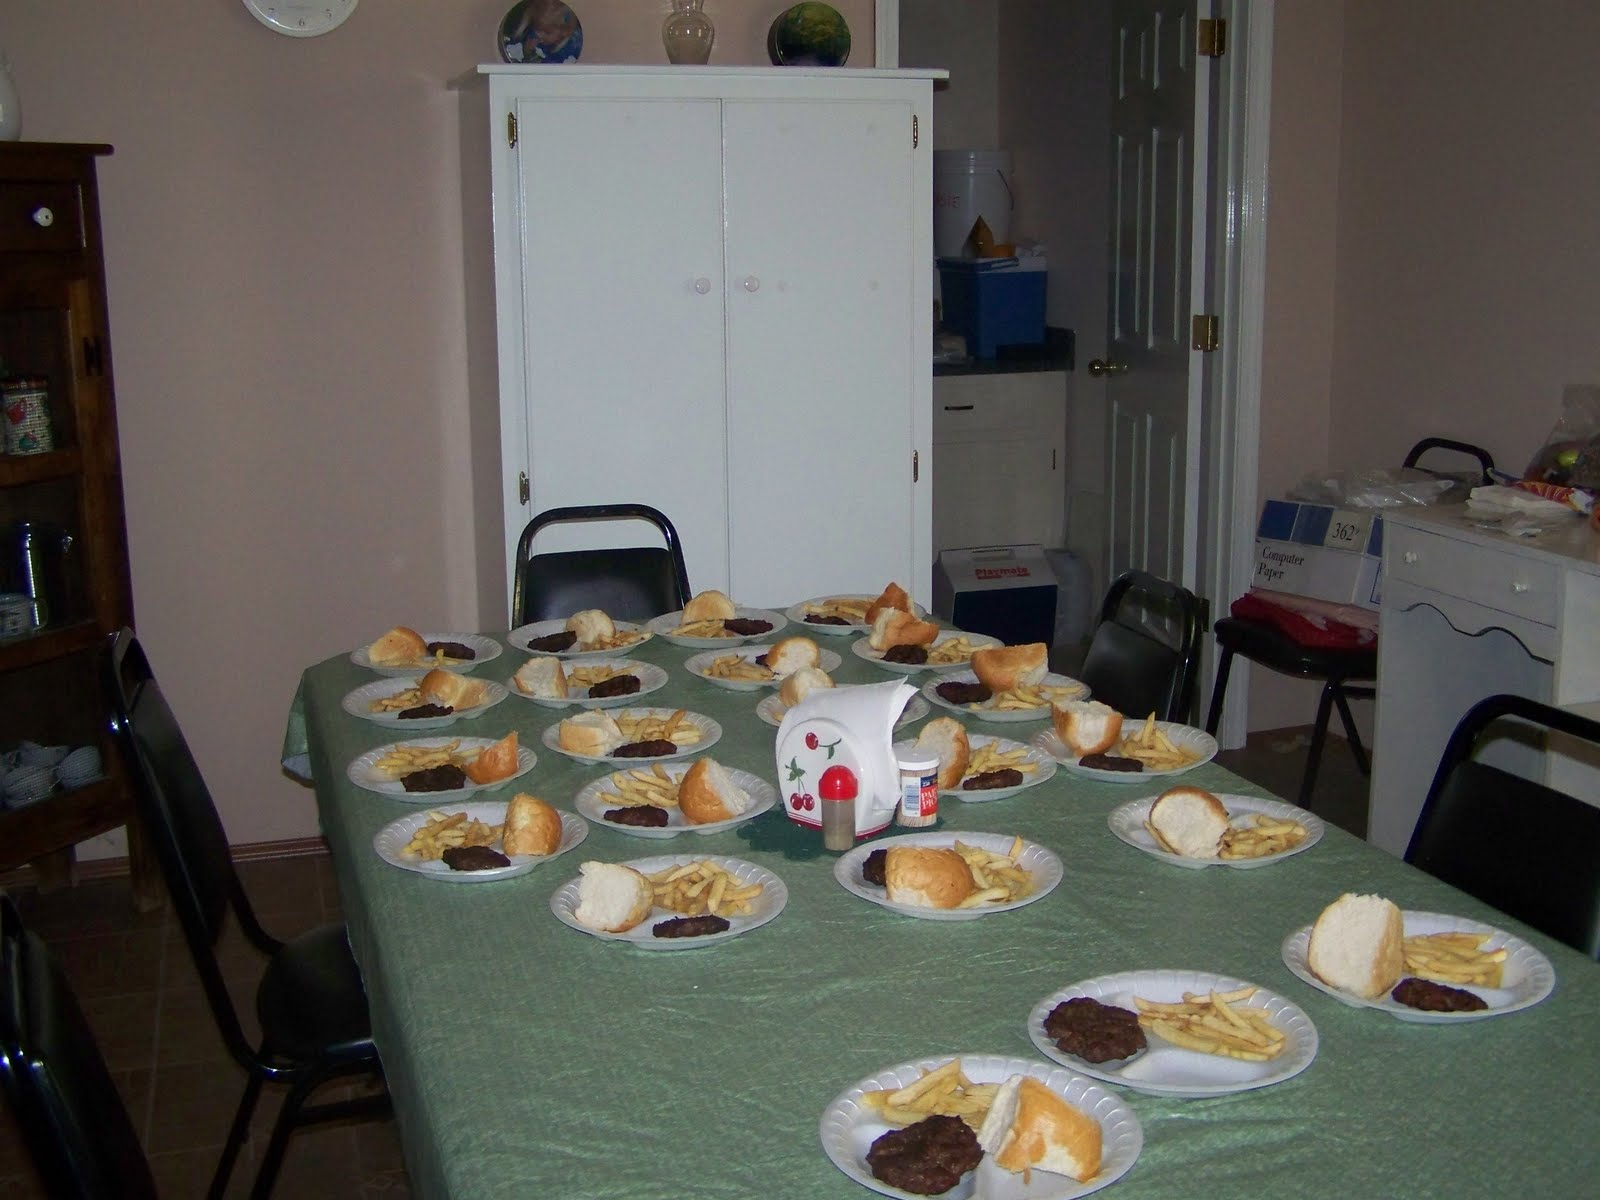 romania ministry of buddy u0026 barbara braswell day retreat for